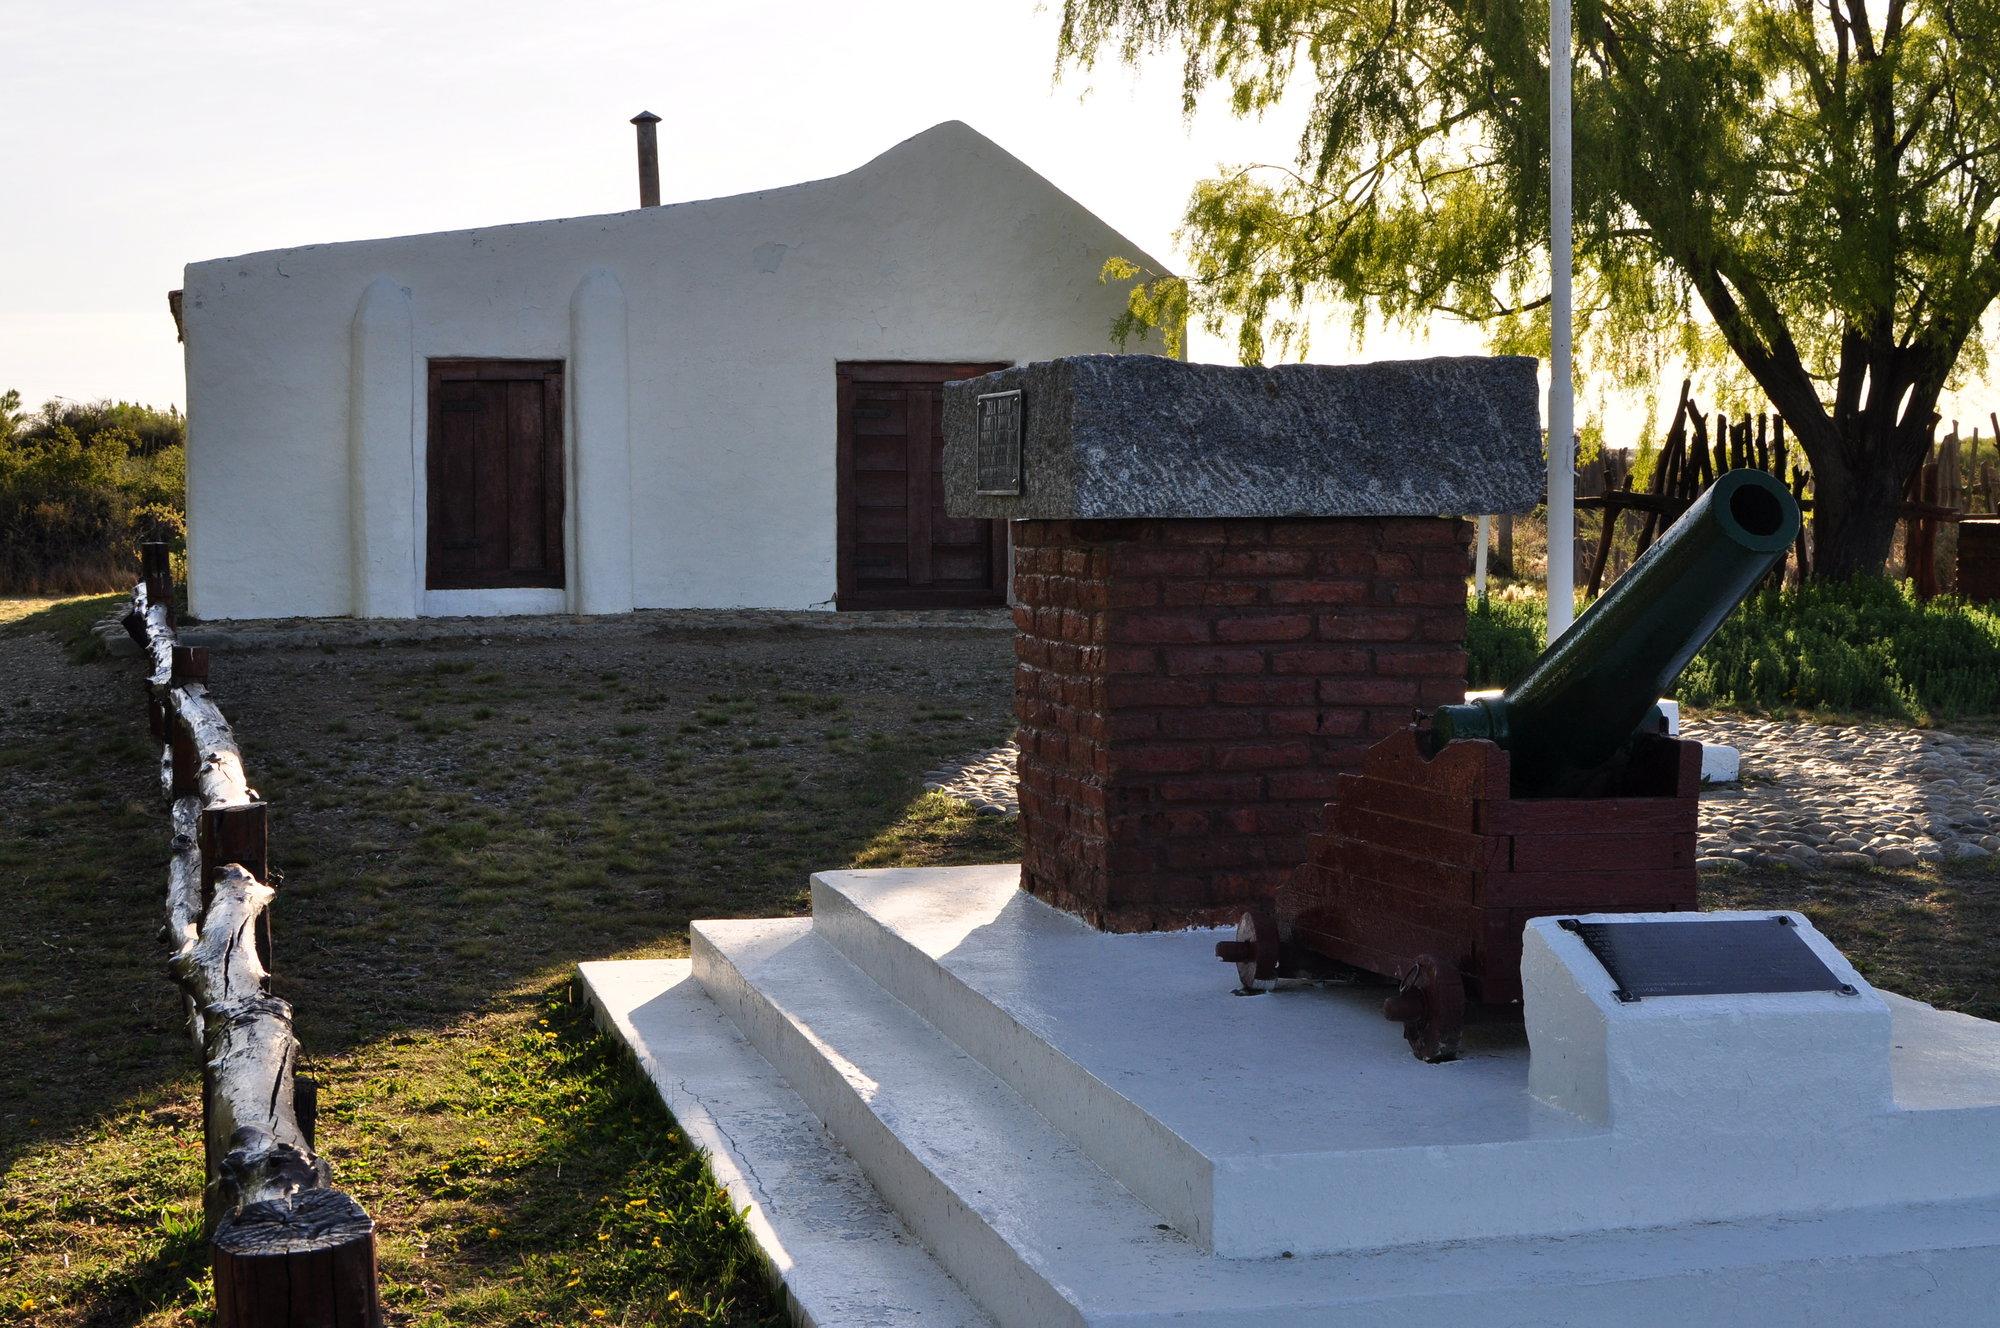 dům velitele Luise Piedra Buena